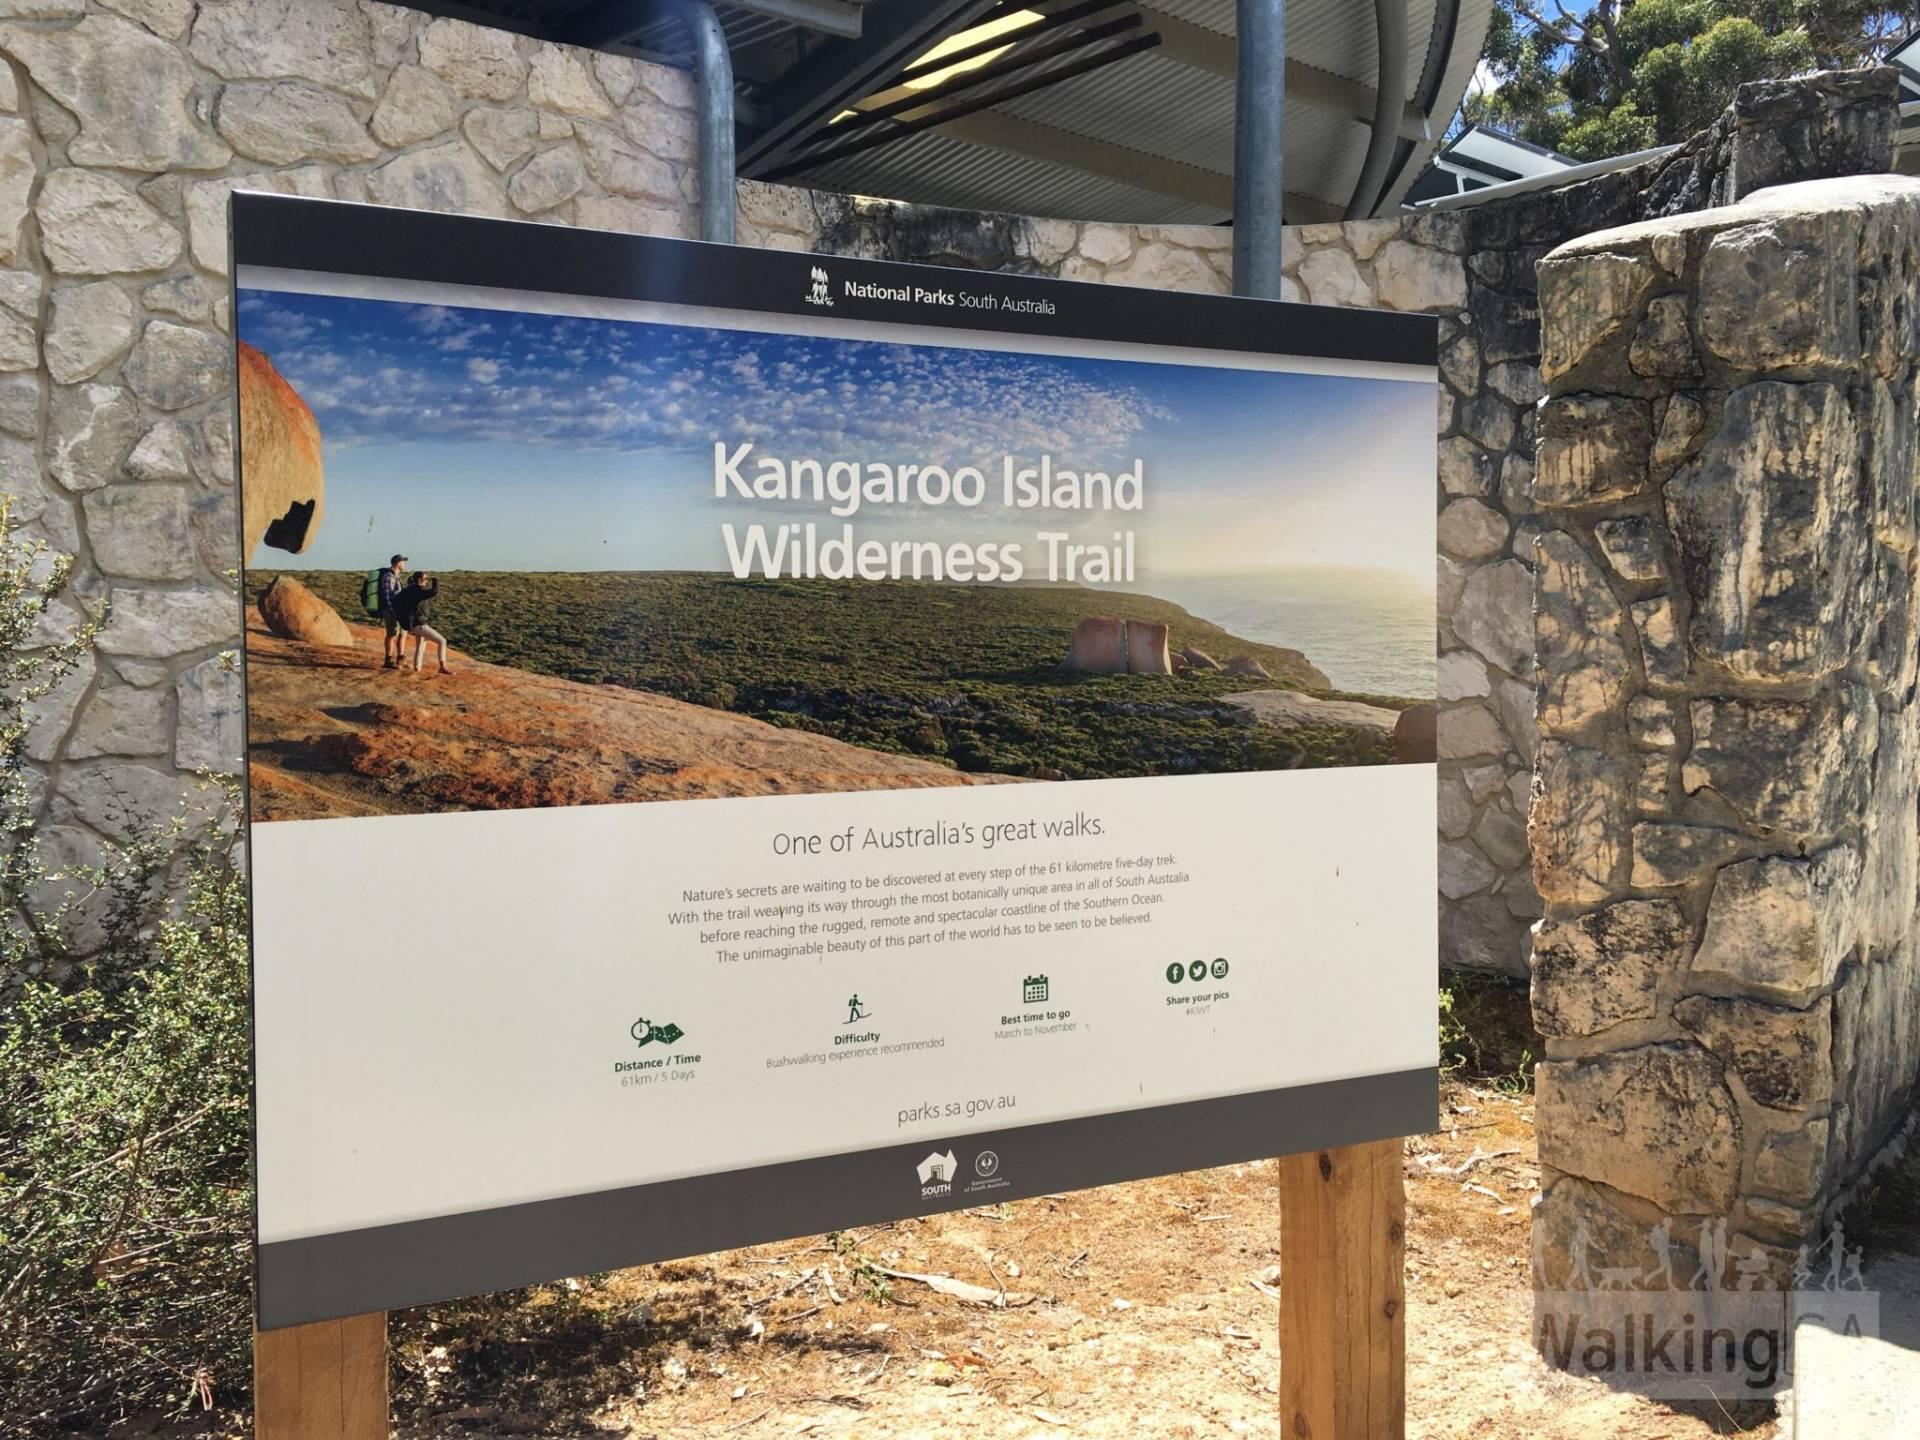 Kangaroo Island Wilderness Trail - Day 1: Rocky River Section